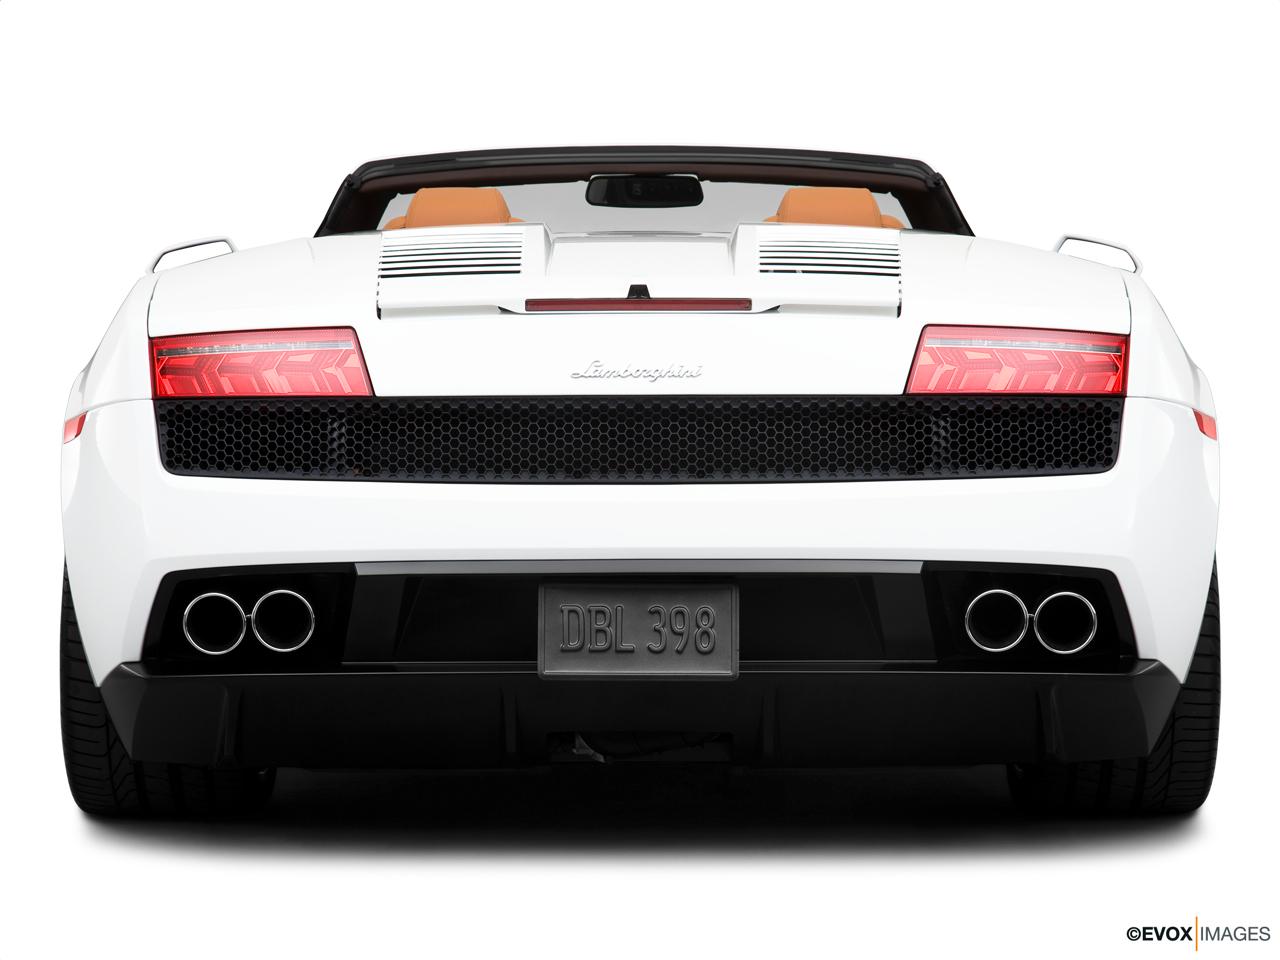 2013 Lamborghini Gallardo Convertible Lp550 2 Front Angle View